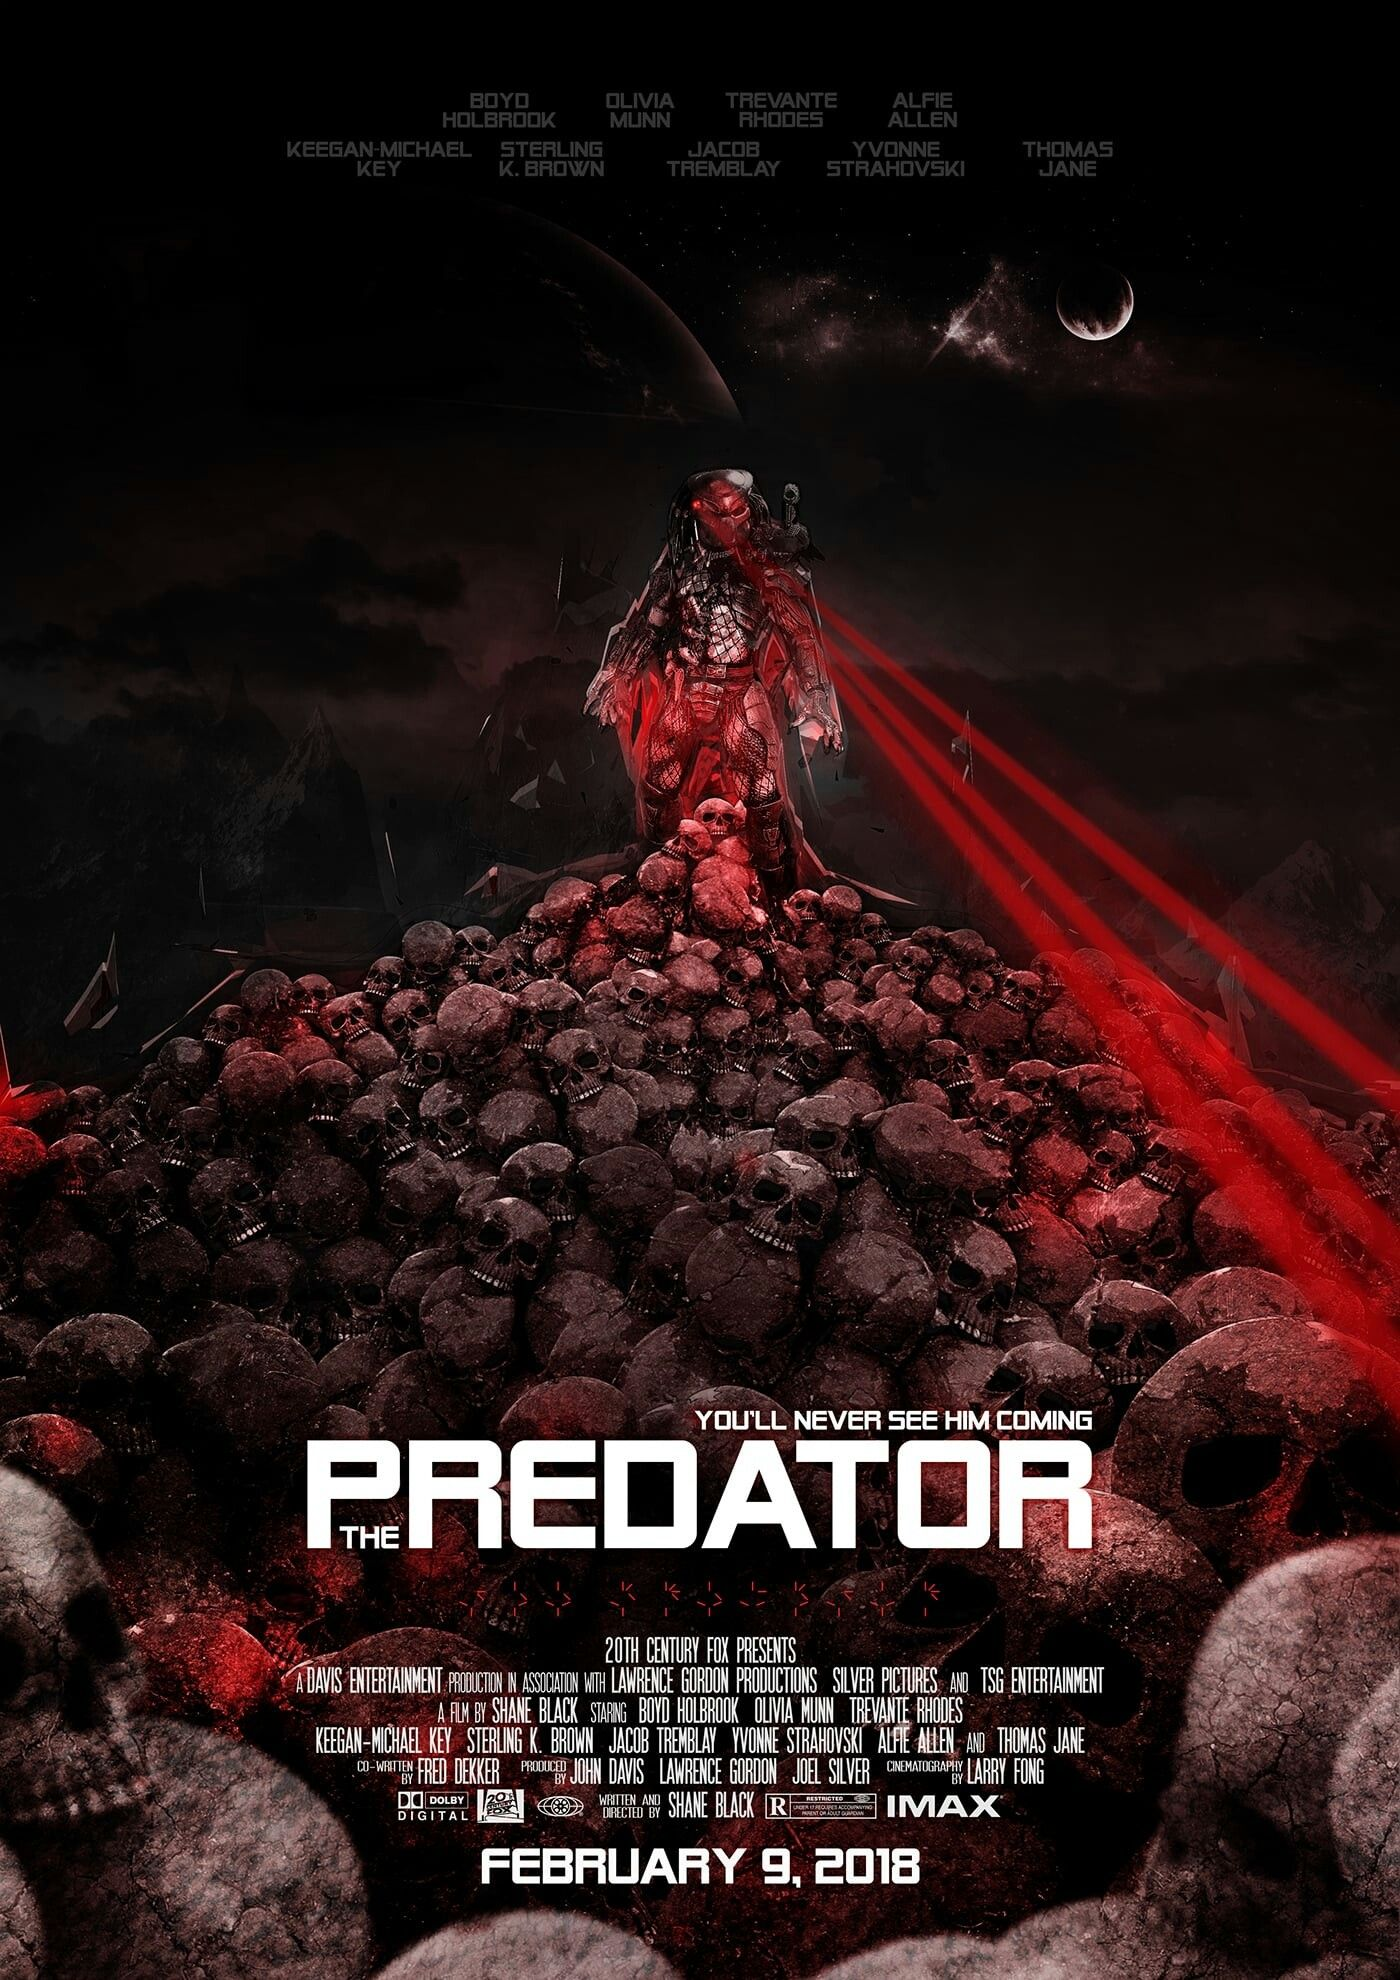 The Predator Movie Poster Thepredator Predator Fantastic Movie